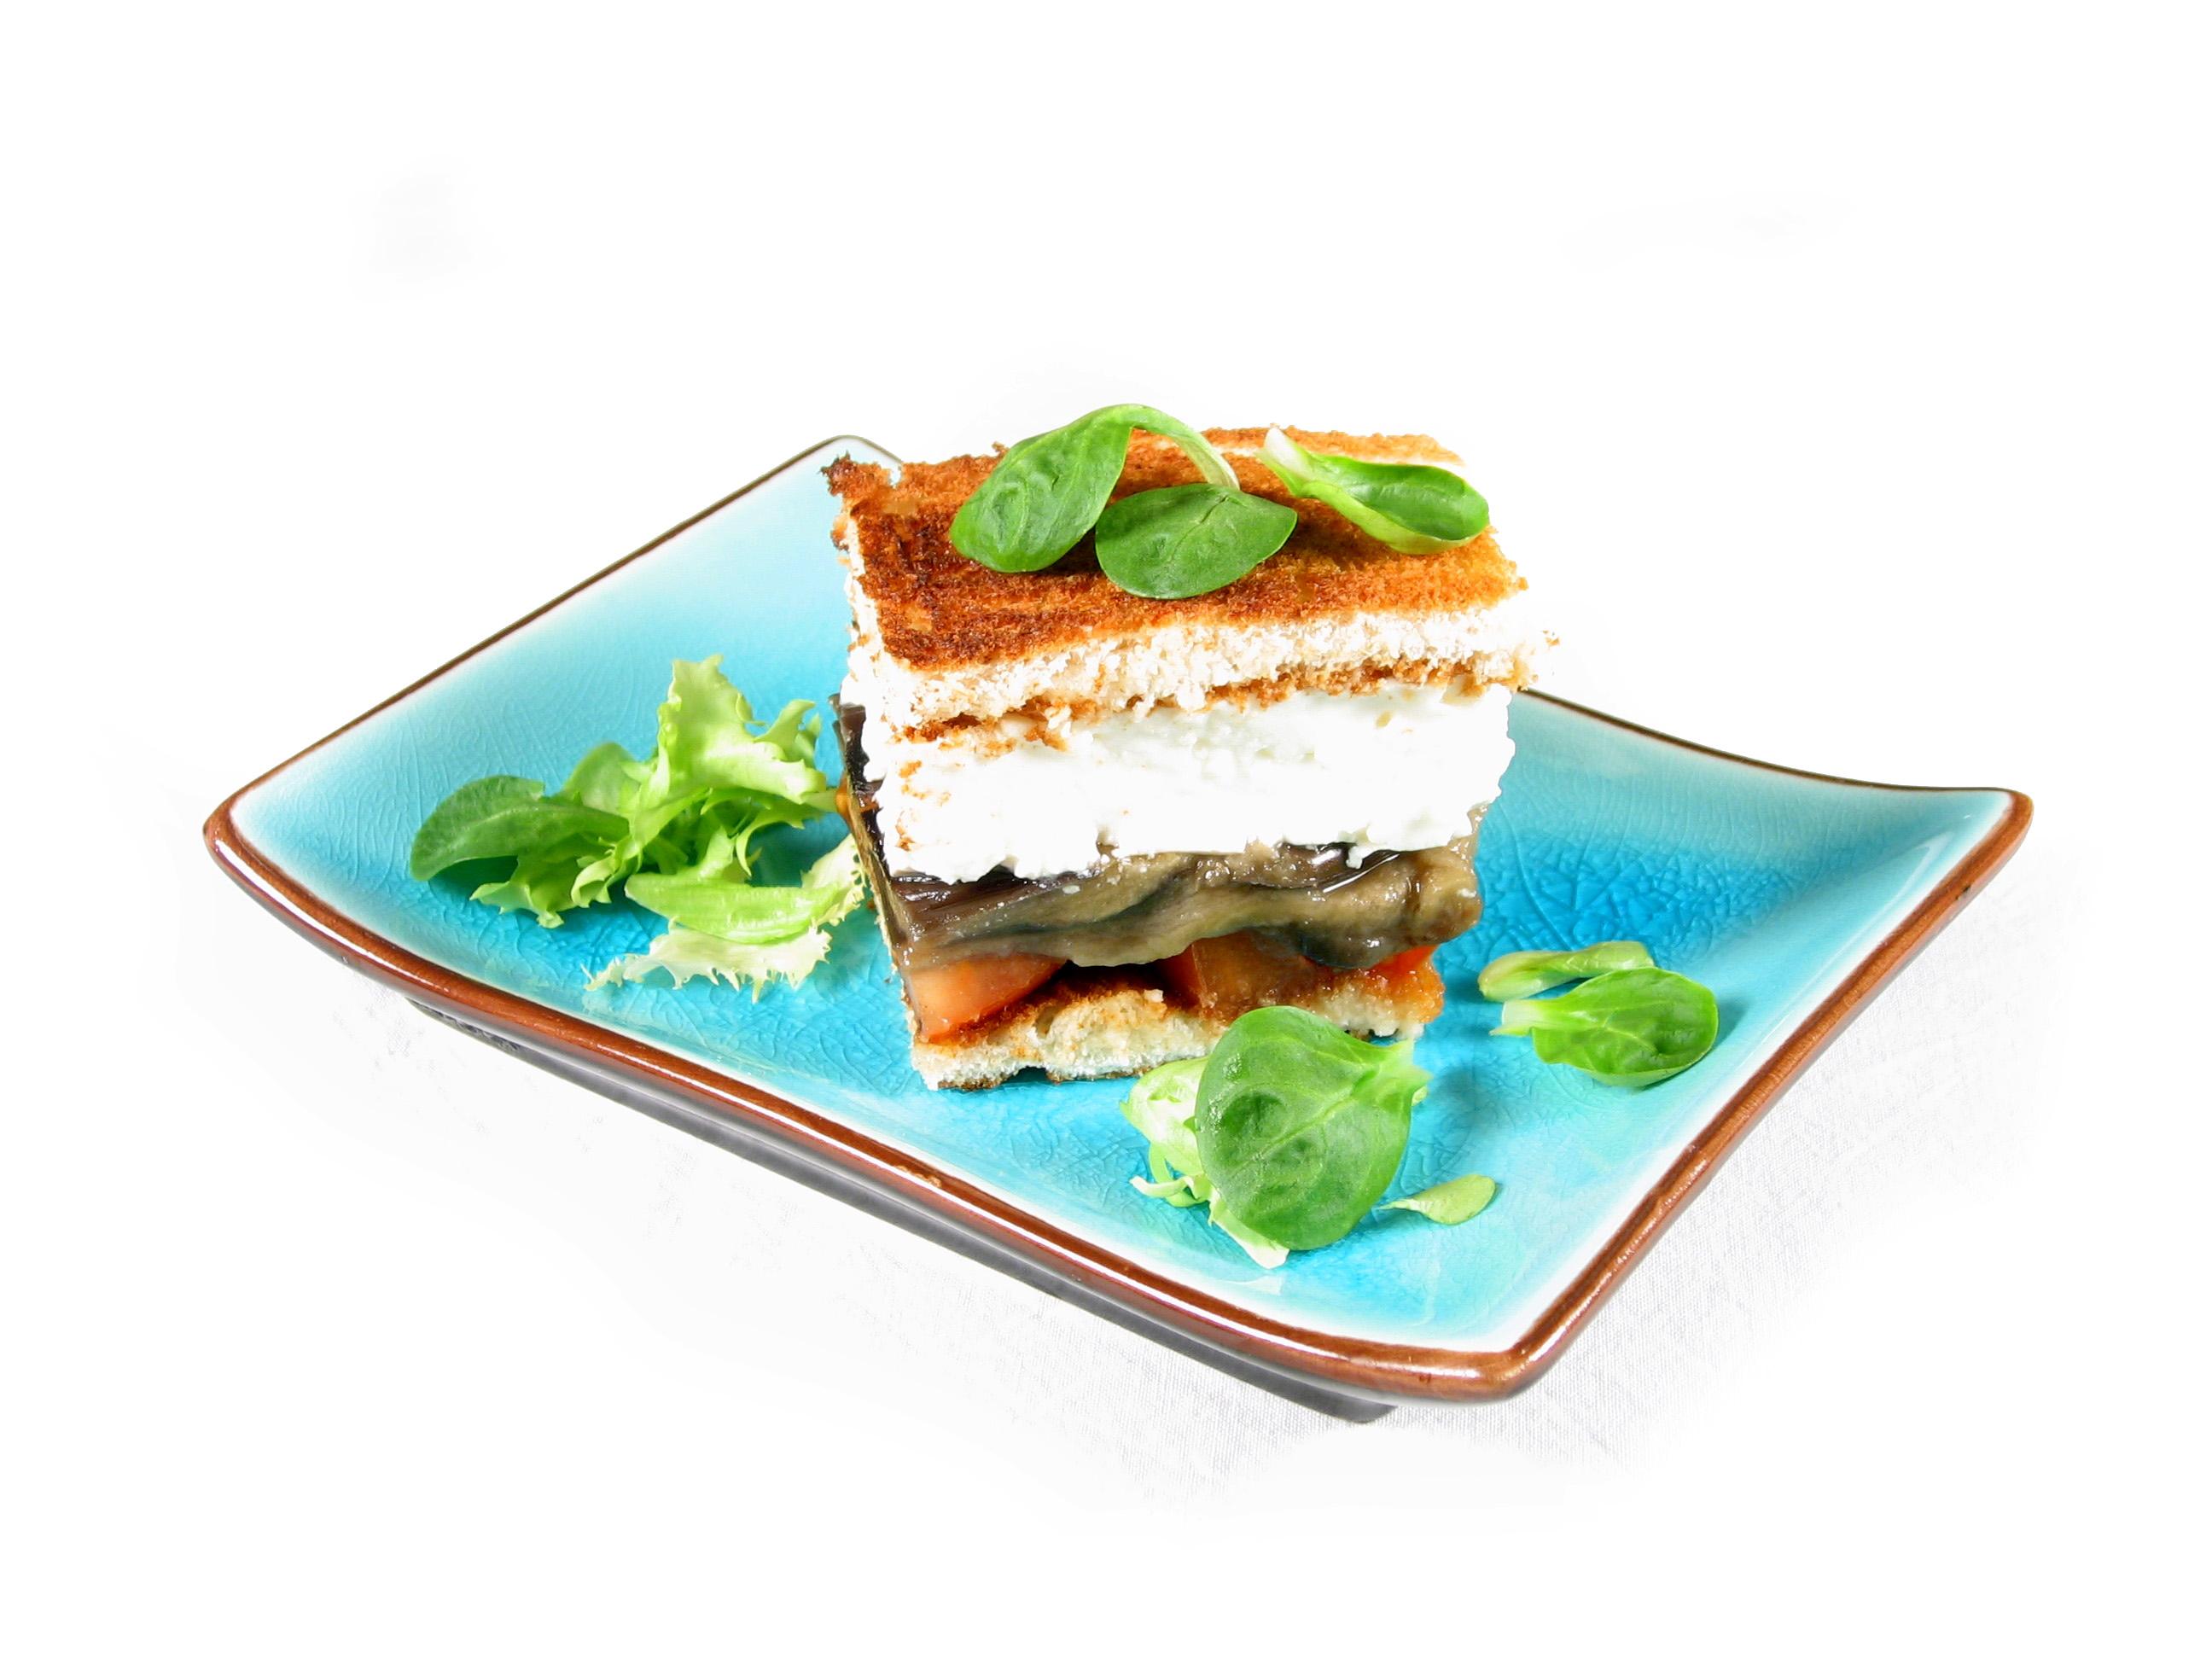 Sándwich de berenjena con pan de molde 100% natural sin corteza EROSKI